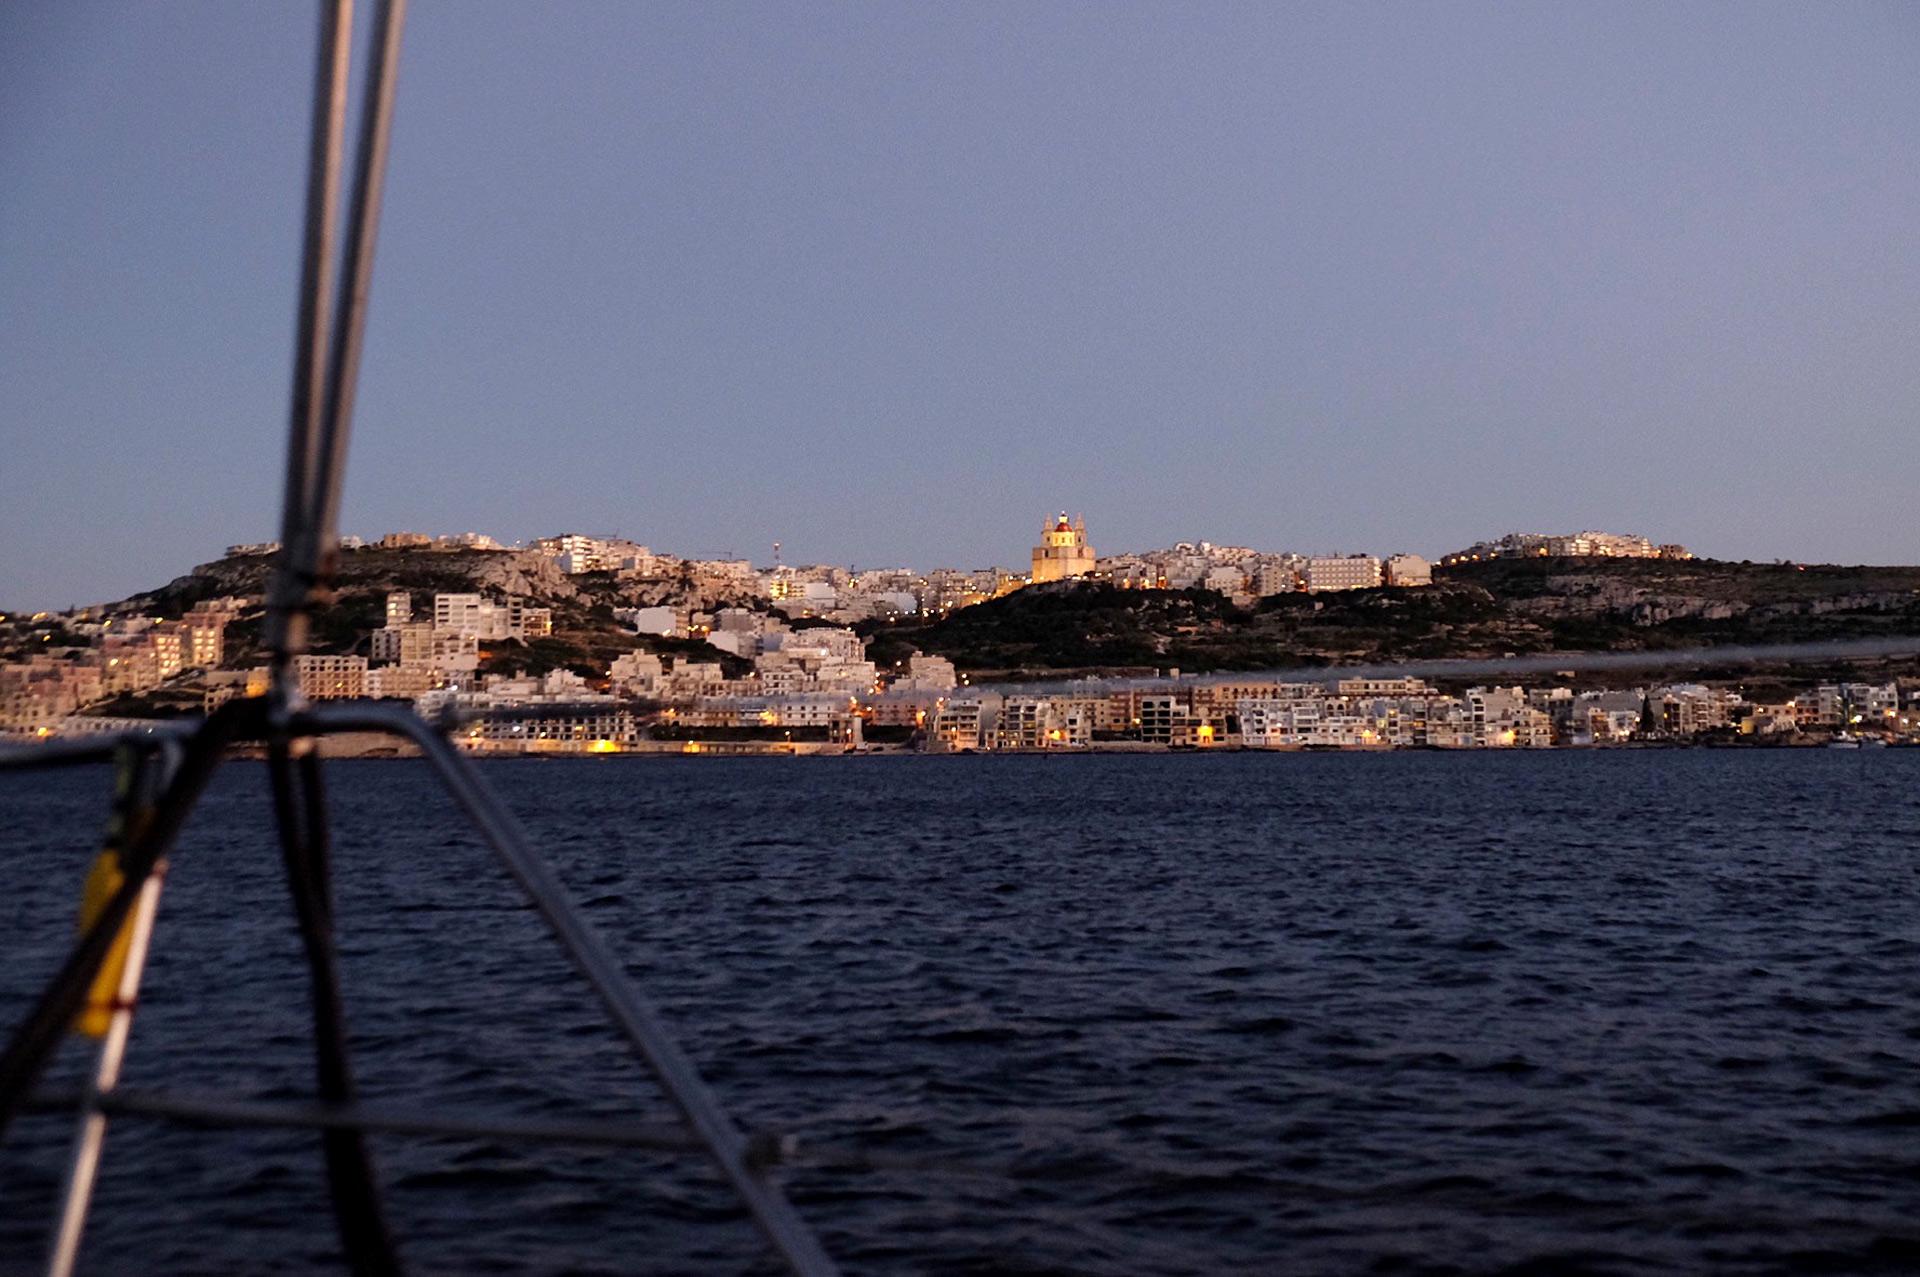 View from Mellieha Bay, Malta